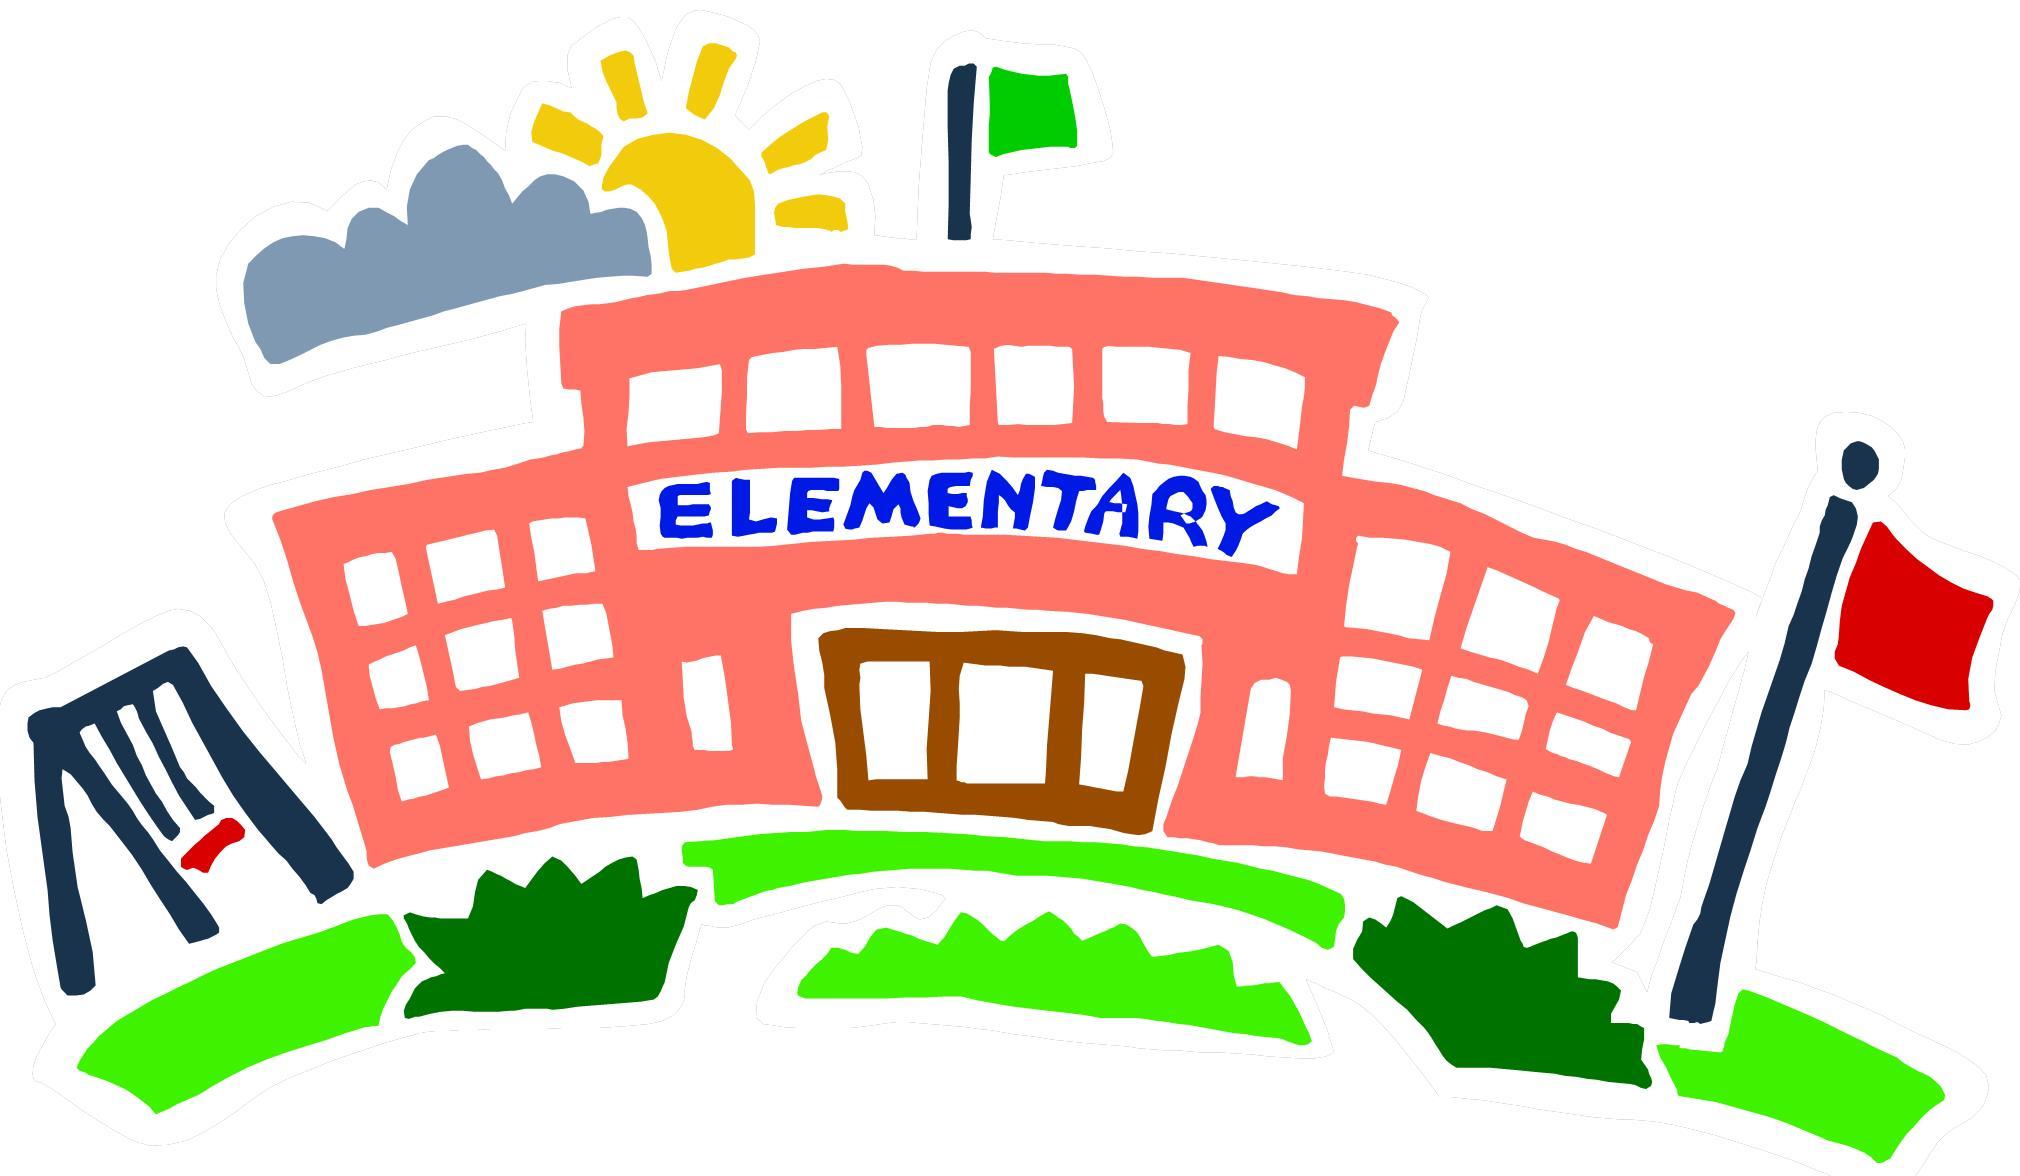 2020x1176 Top School Clip Art Free Clipart Image 2